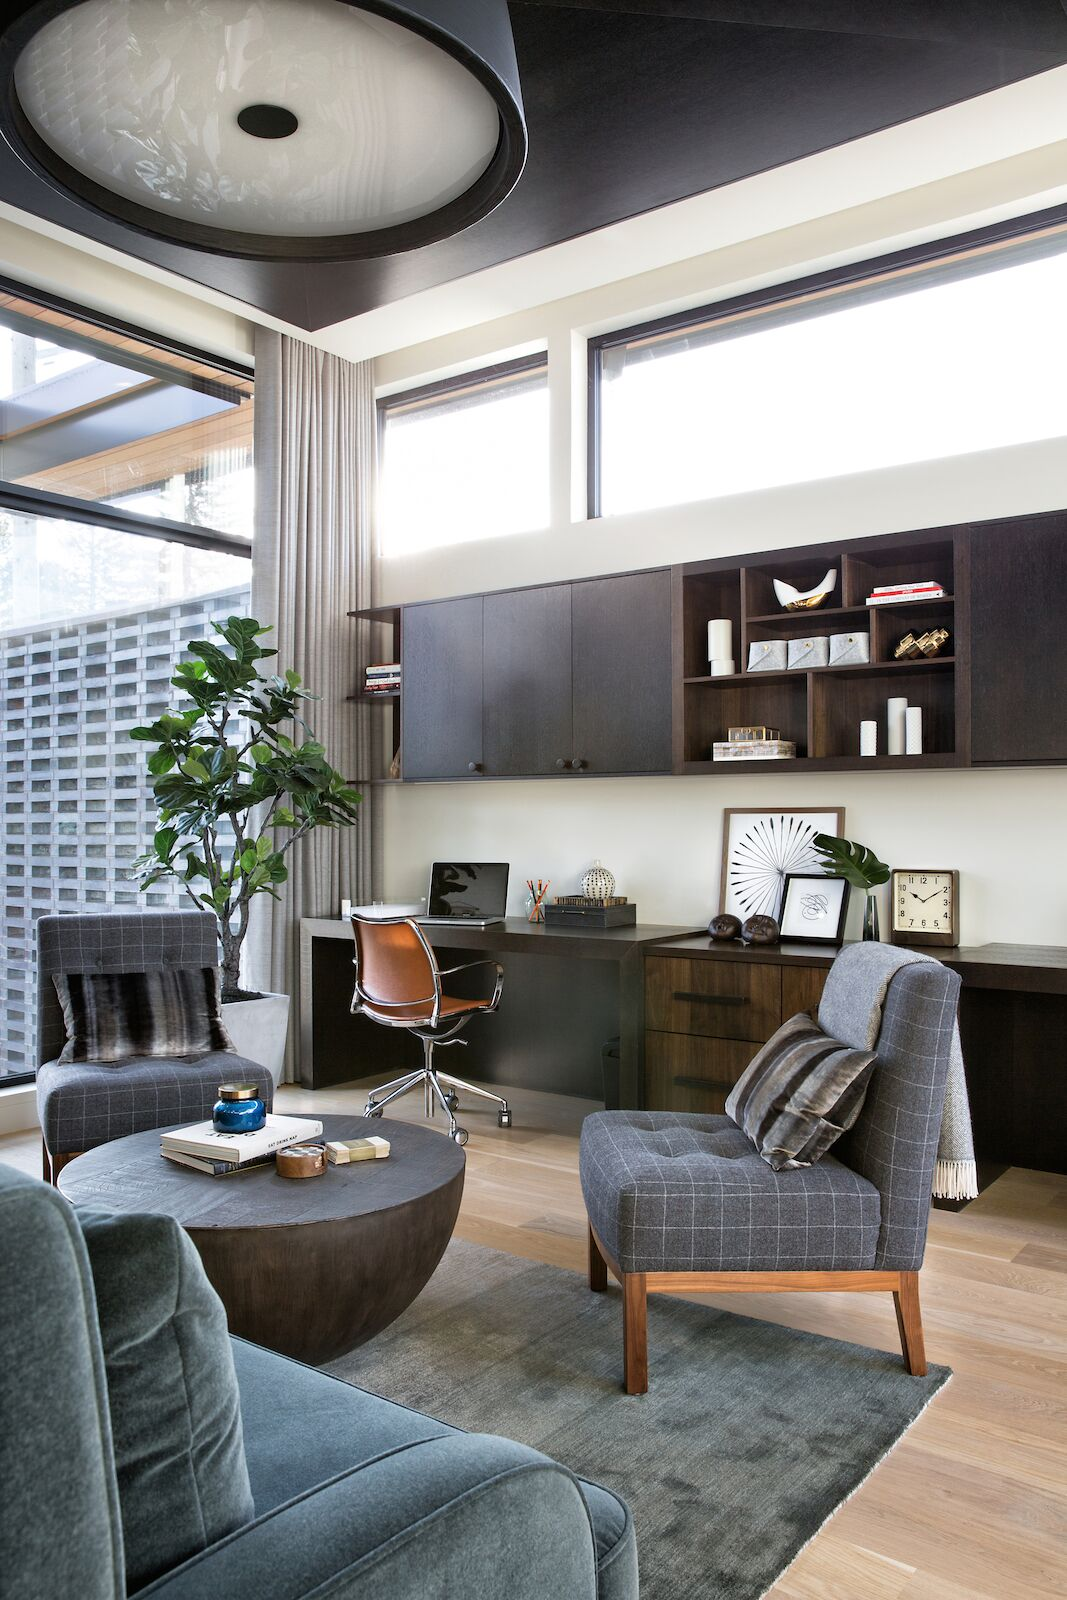 Nyla Free Designs, elbow park modern, Top office design details.